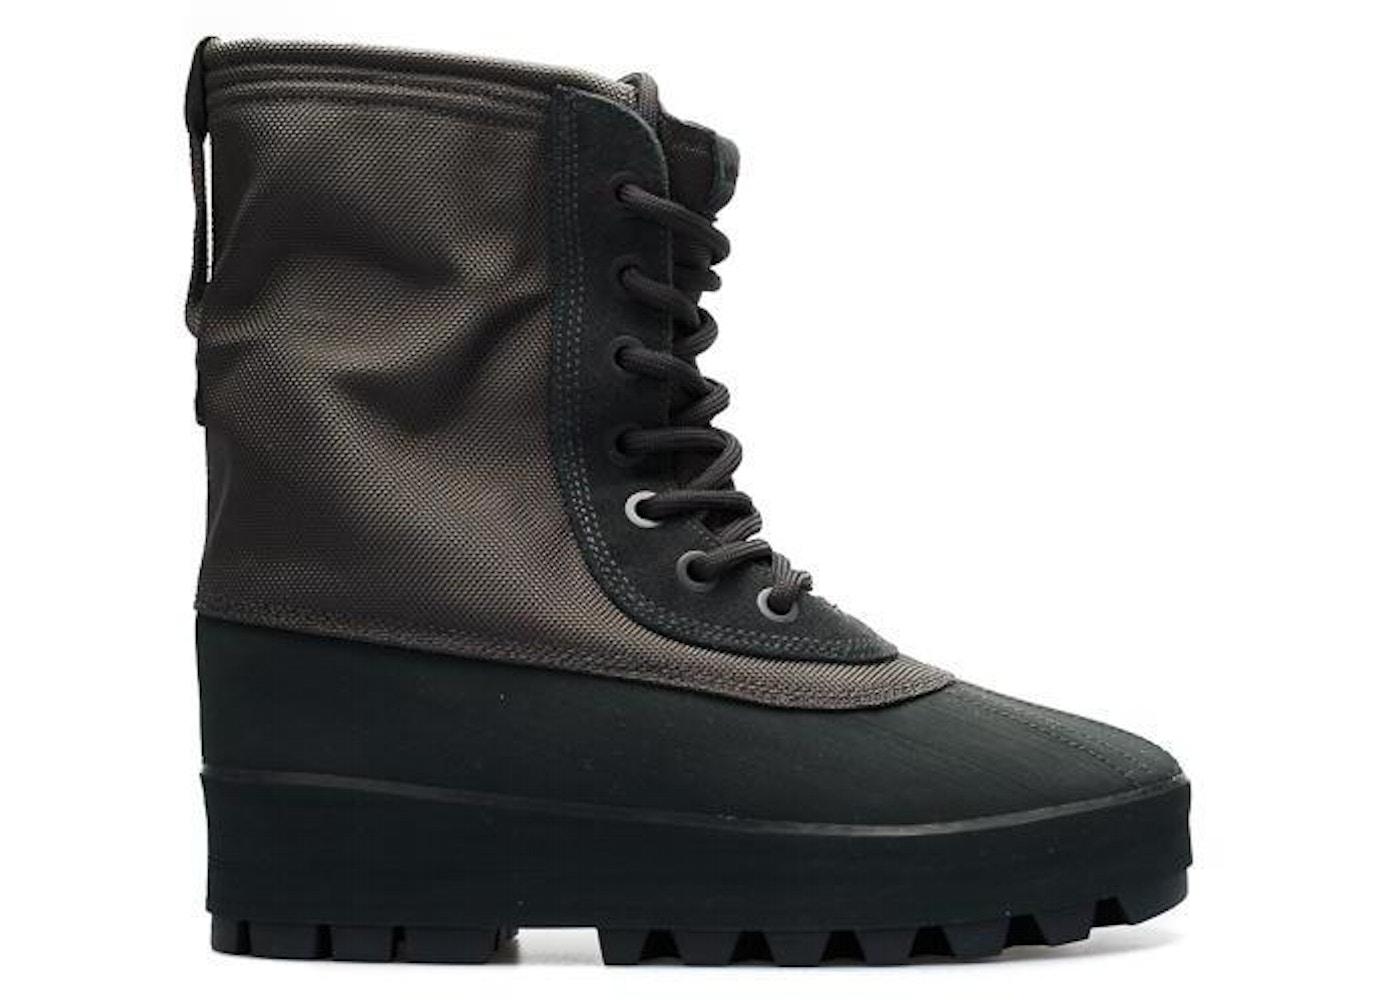 preschool adidas Yeezy 950 Buy adidas Yeezy 950 Shoes & Deadstock Sneakers